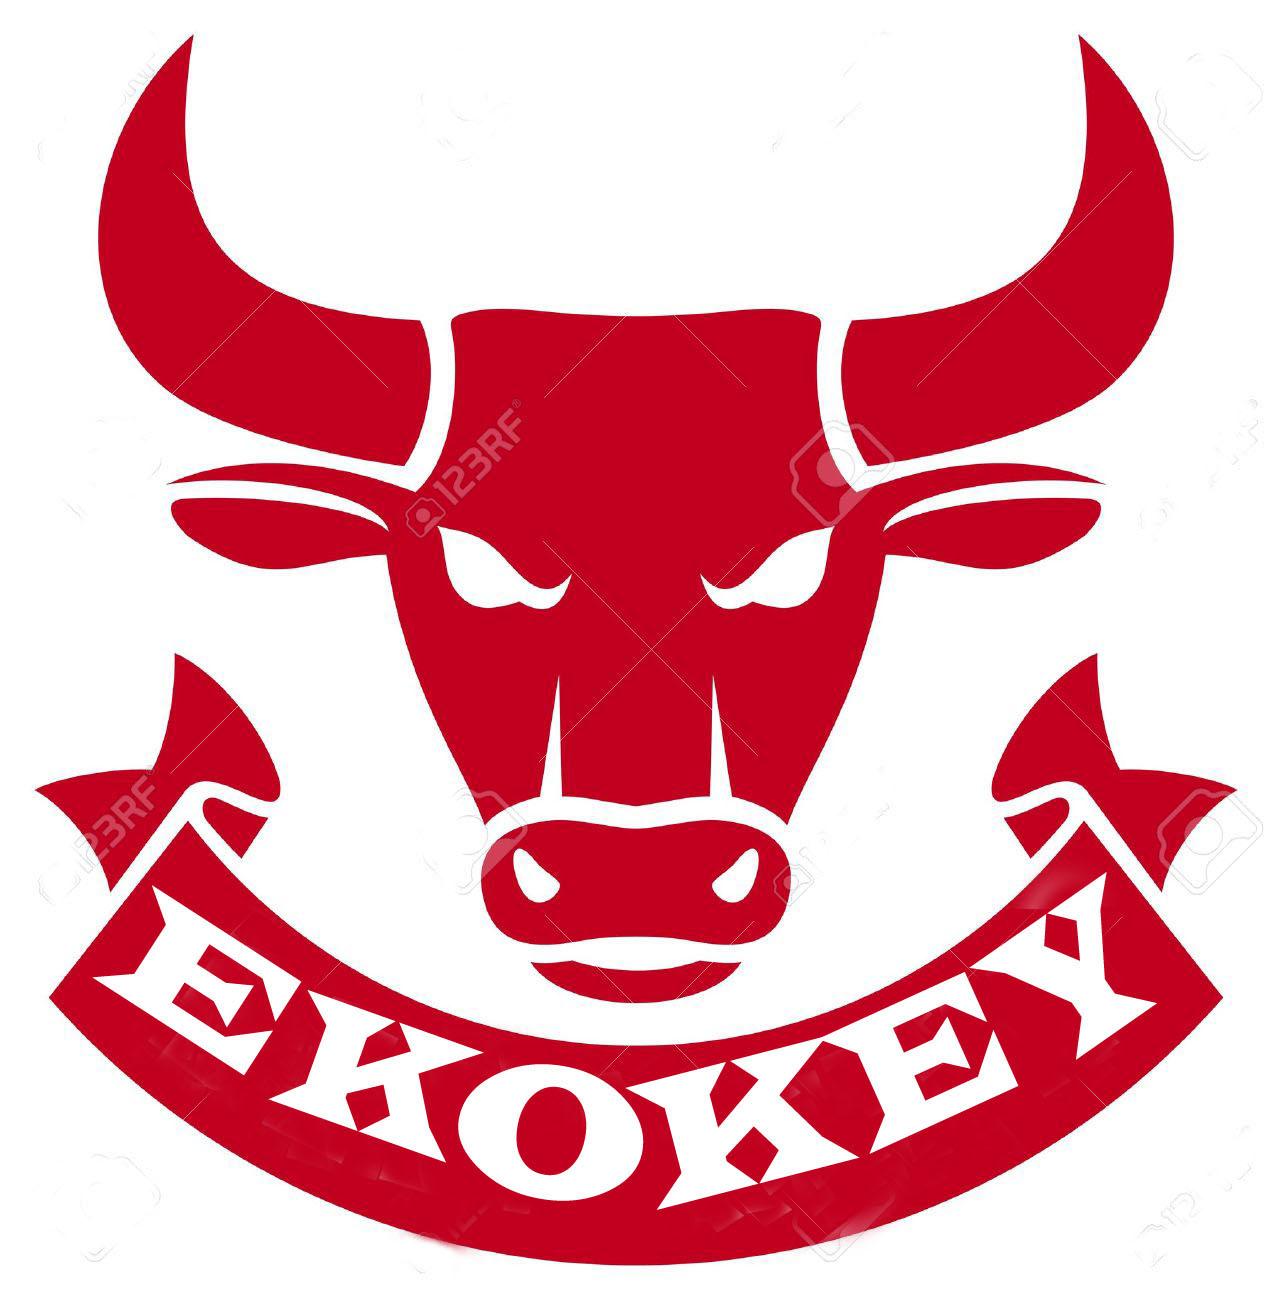 ekokey foreign trade doo Main Image